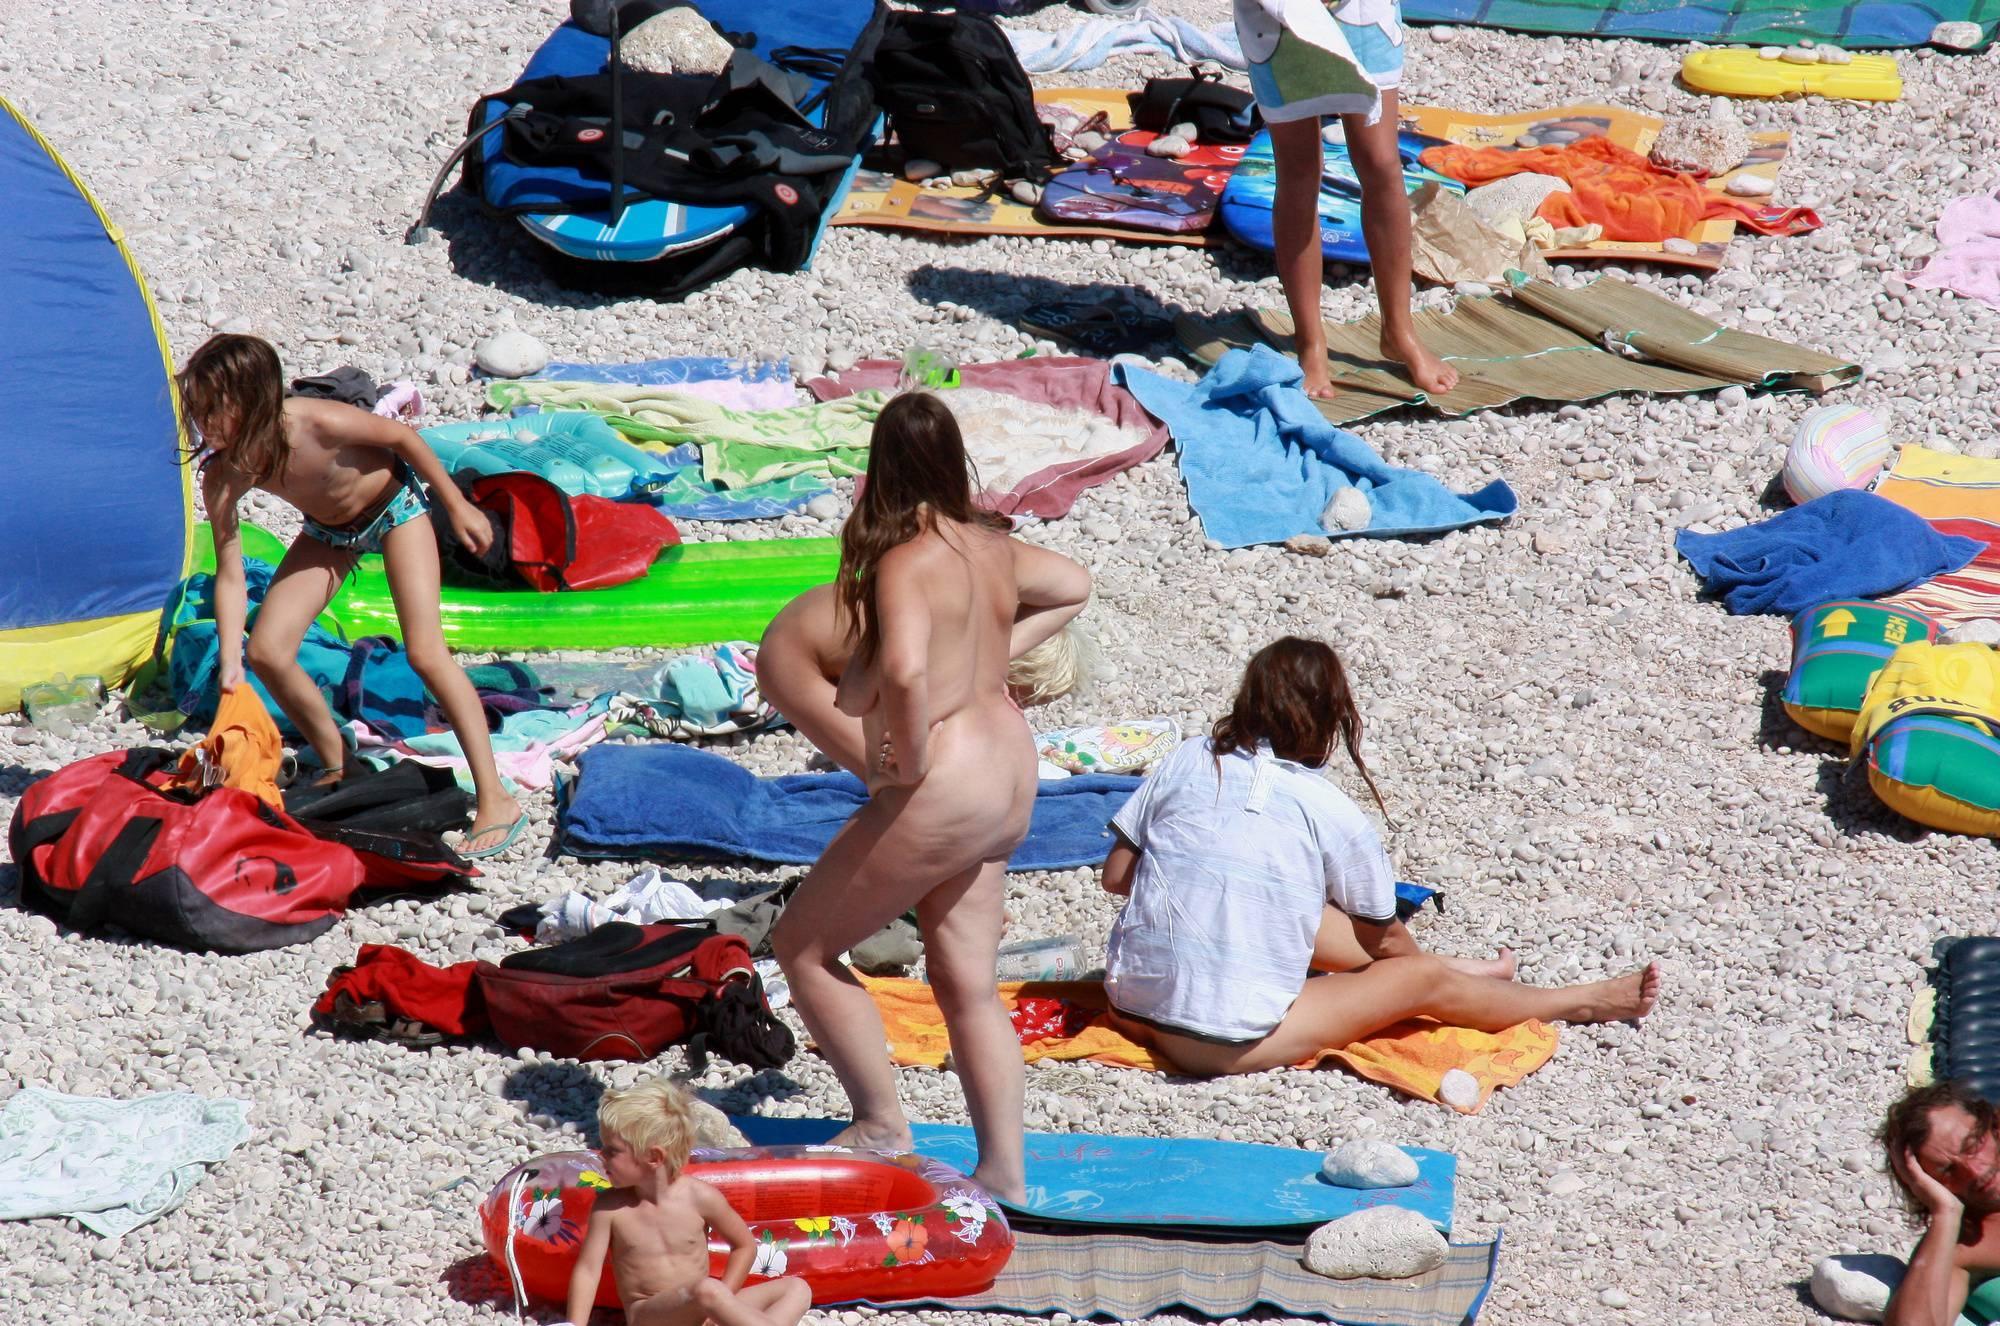 Nude Family Beach Colors - 1